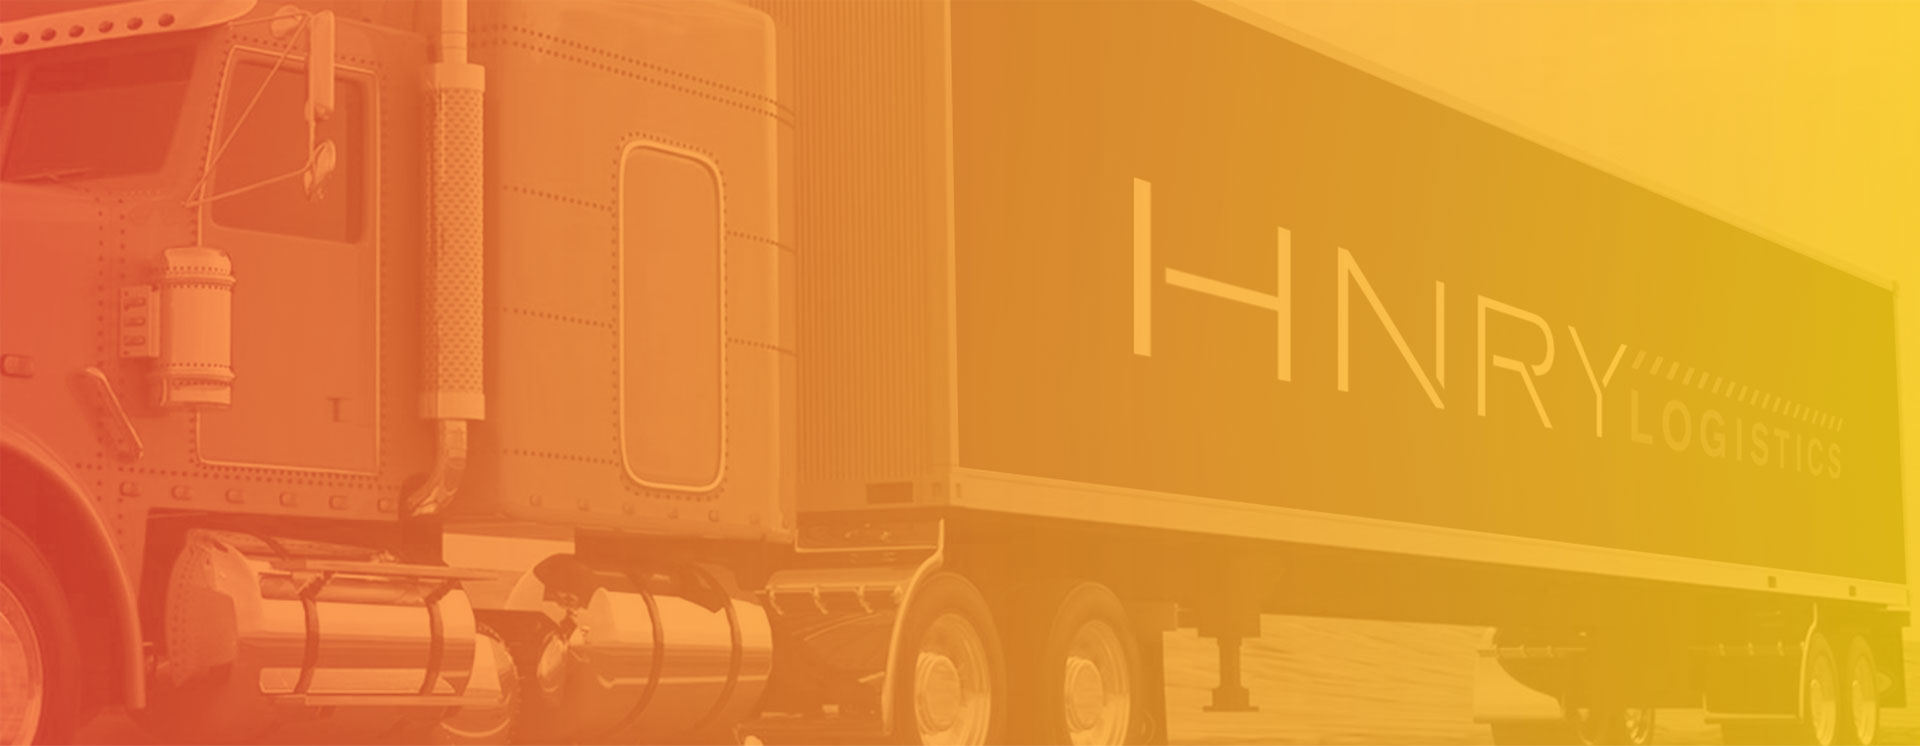 HNRY - Brand Identity, Branding, Logo Design, Print Design